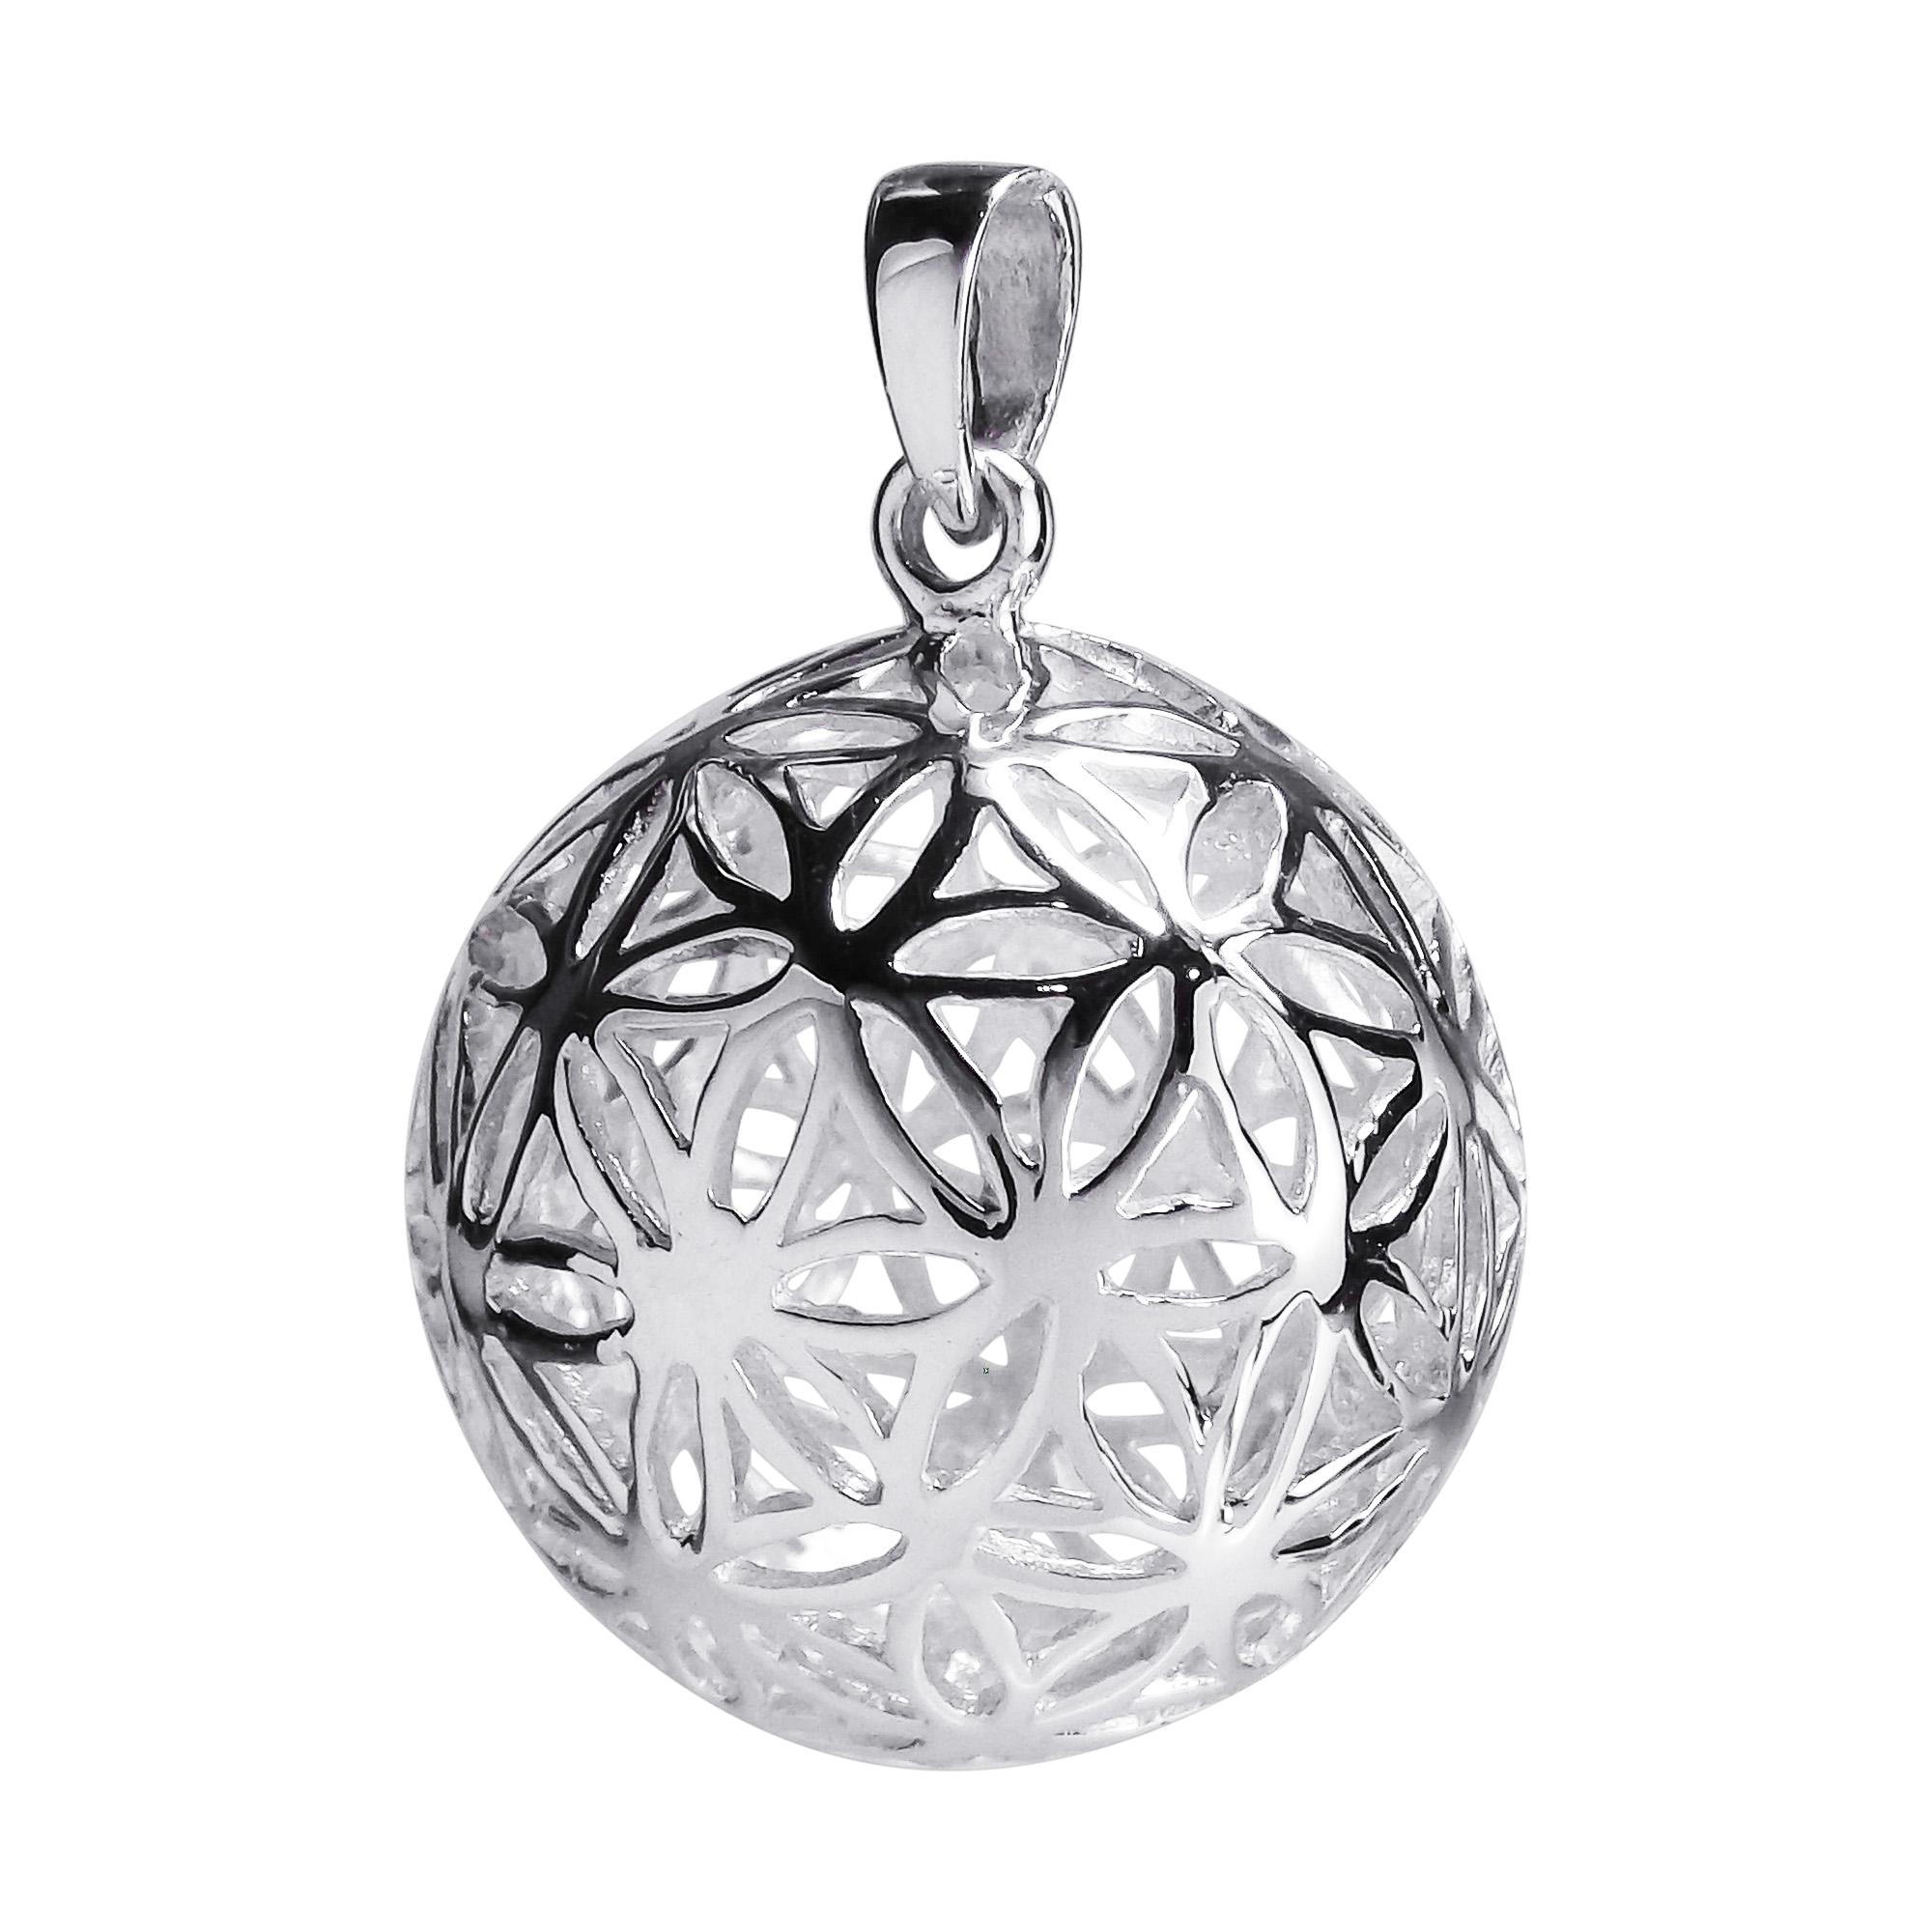 Flower of life kabbalah 3d ball sterling silver pendant aeravida flower of life kabbalah 3d ball sterling silver pendant mozeypictures Gallery